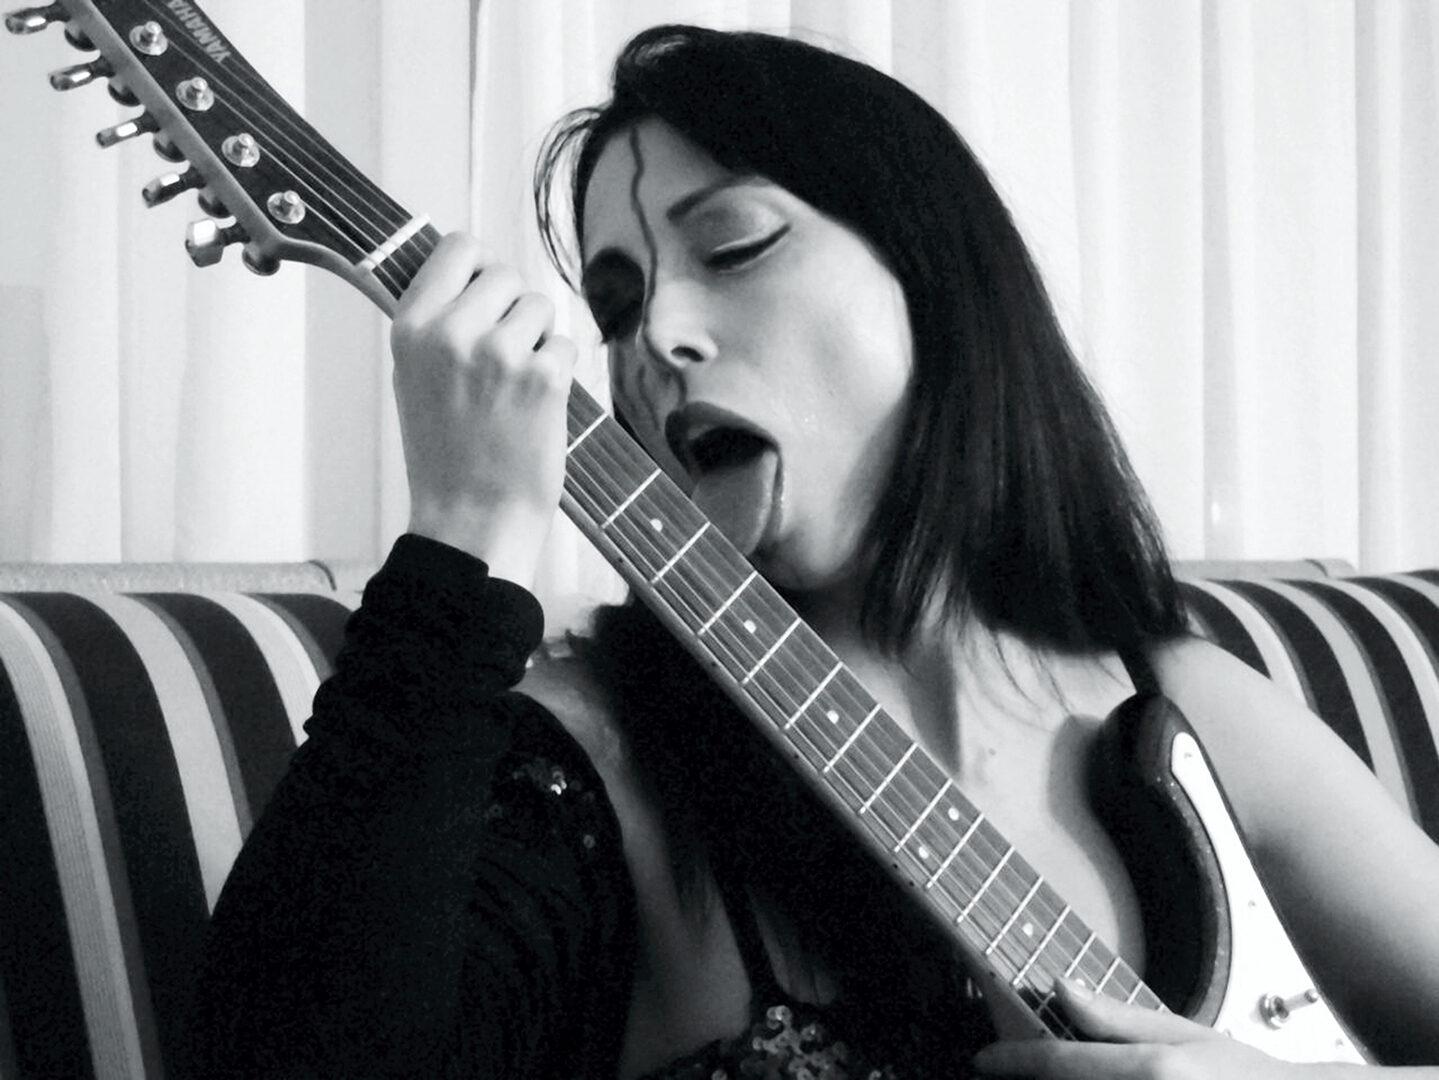 Silversnake Michelle Guitars Lick Music Taste